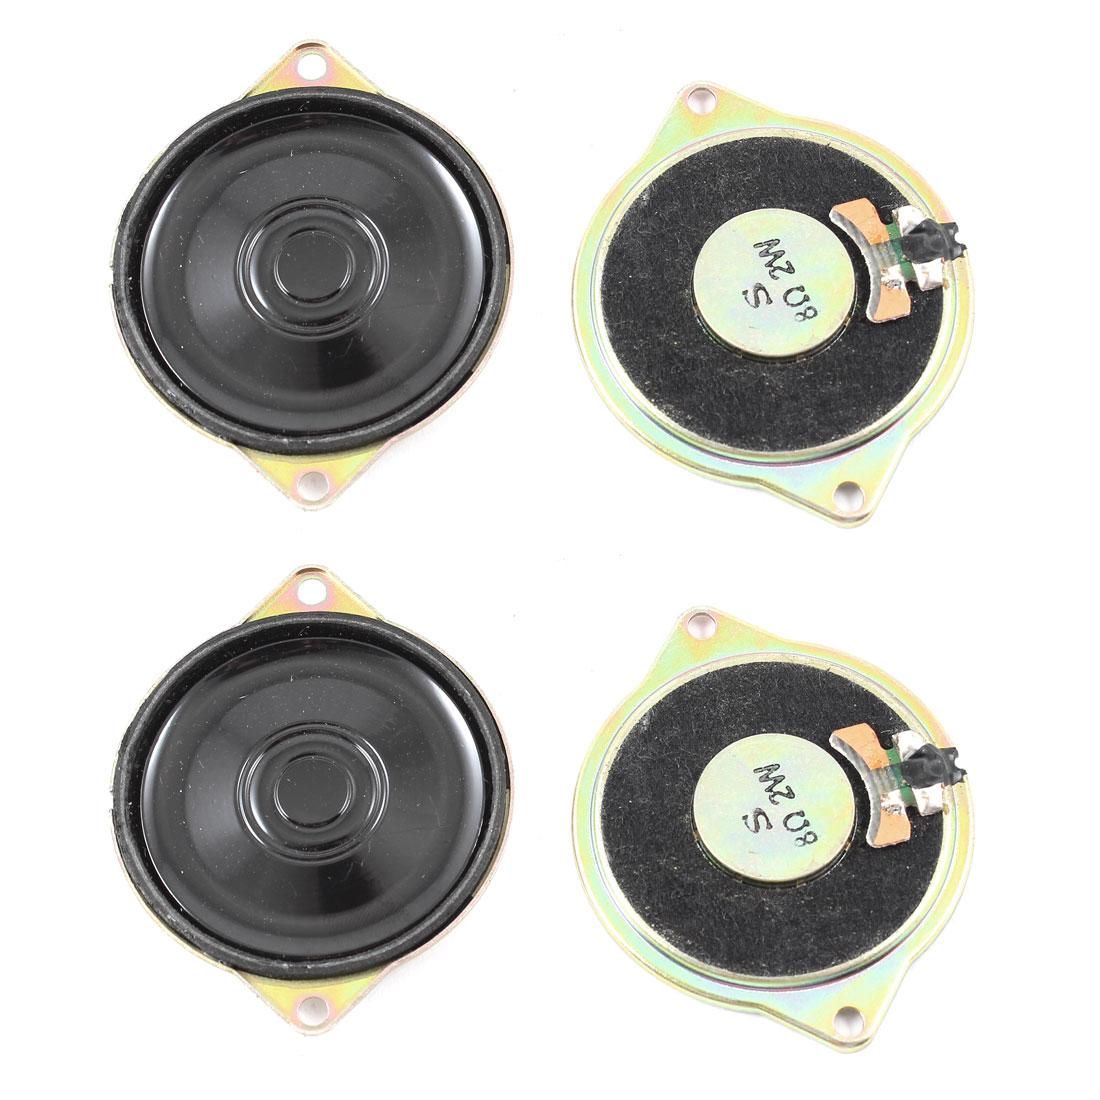 2W 8 Ohm Metal Housing Round Internal Magnet Speaker Loudspeaker Horn 4Pcs